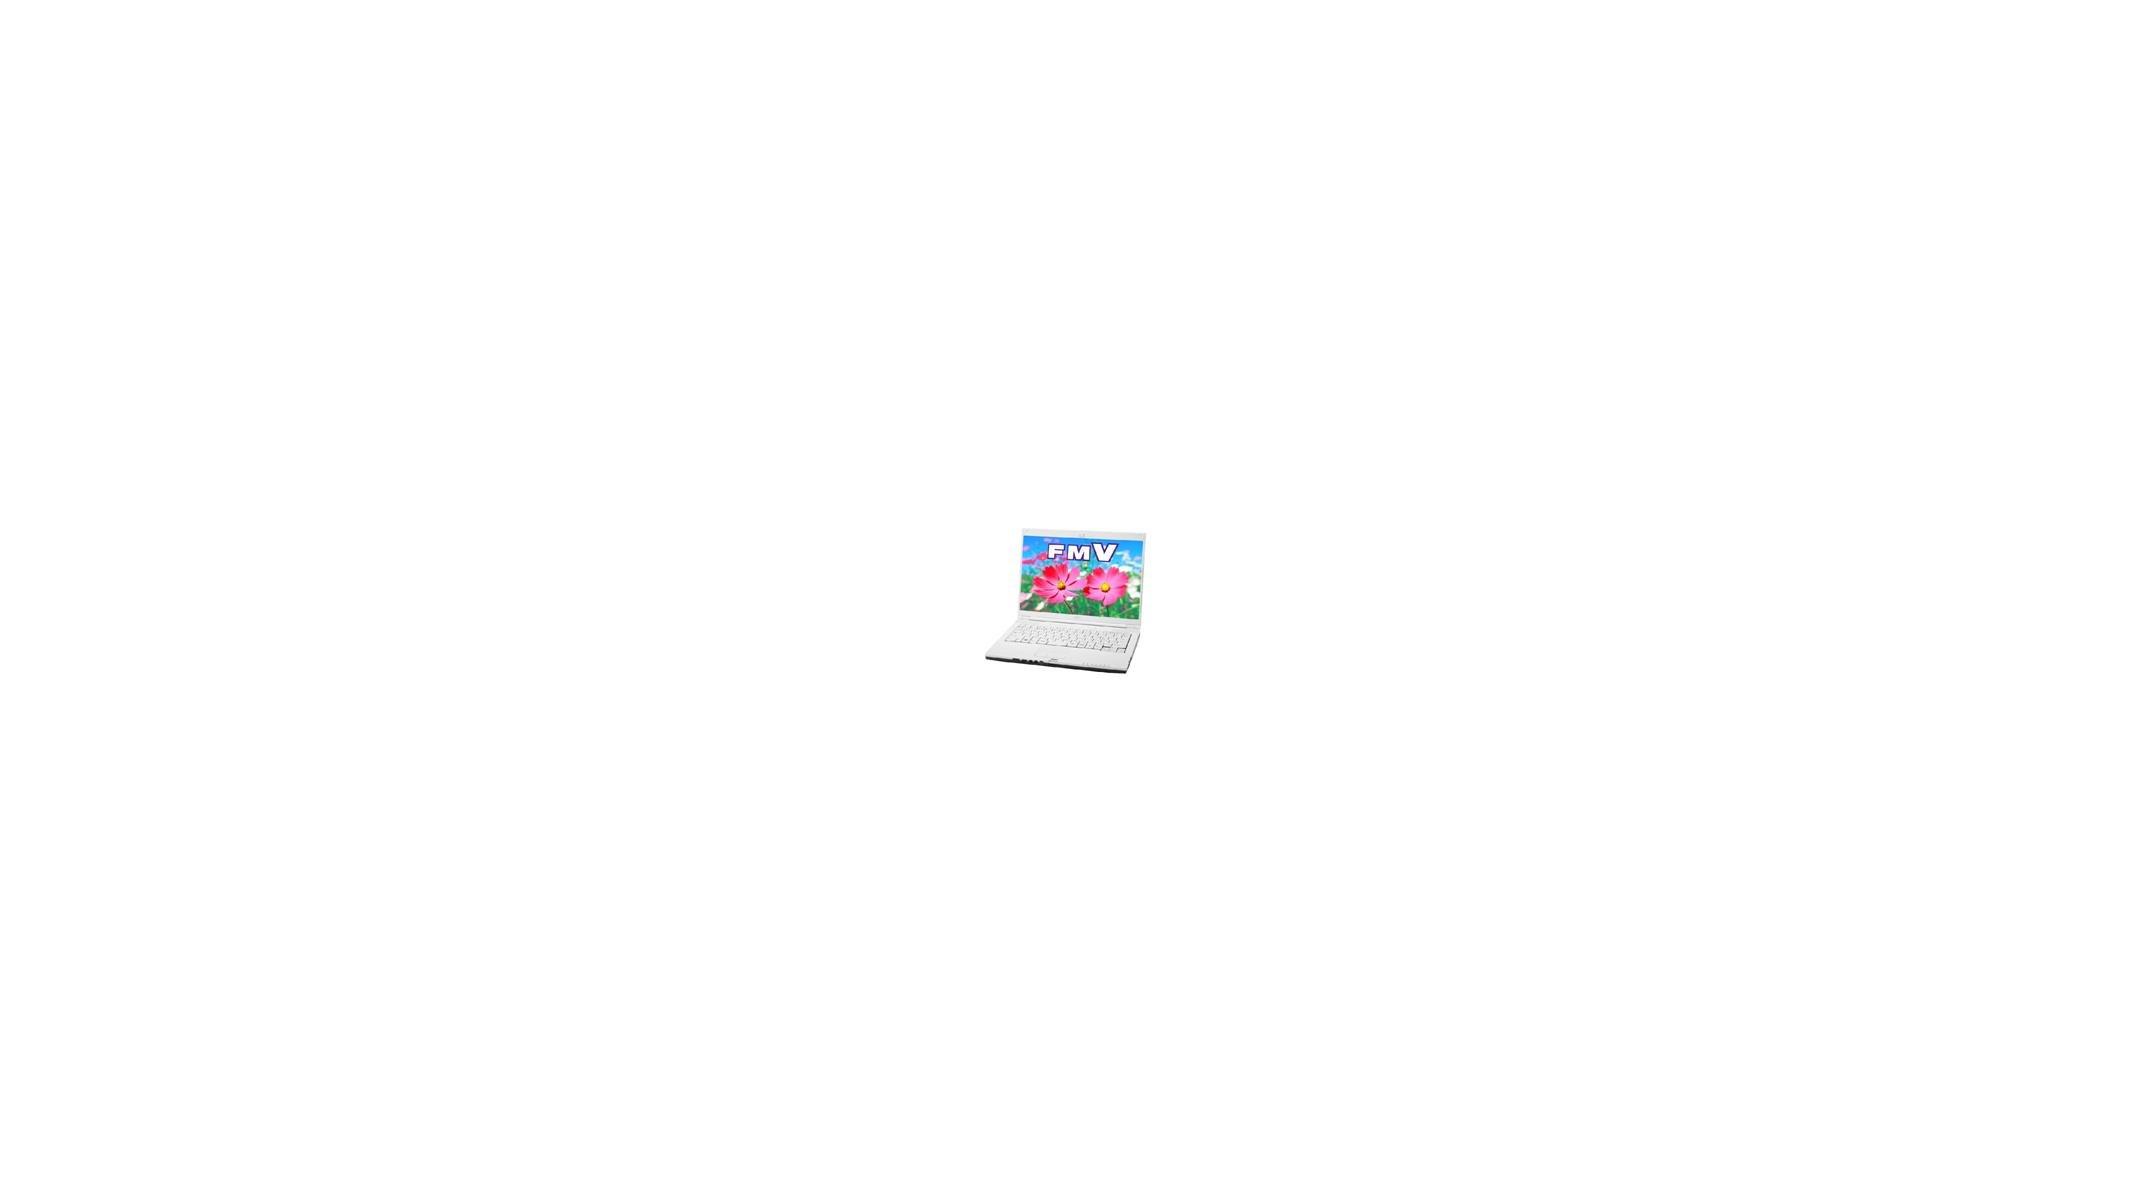 S3 GRAPHICS CHROME 430 ULP DRIVER WINDOWS XP